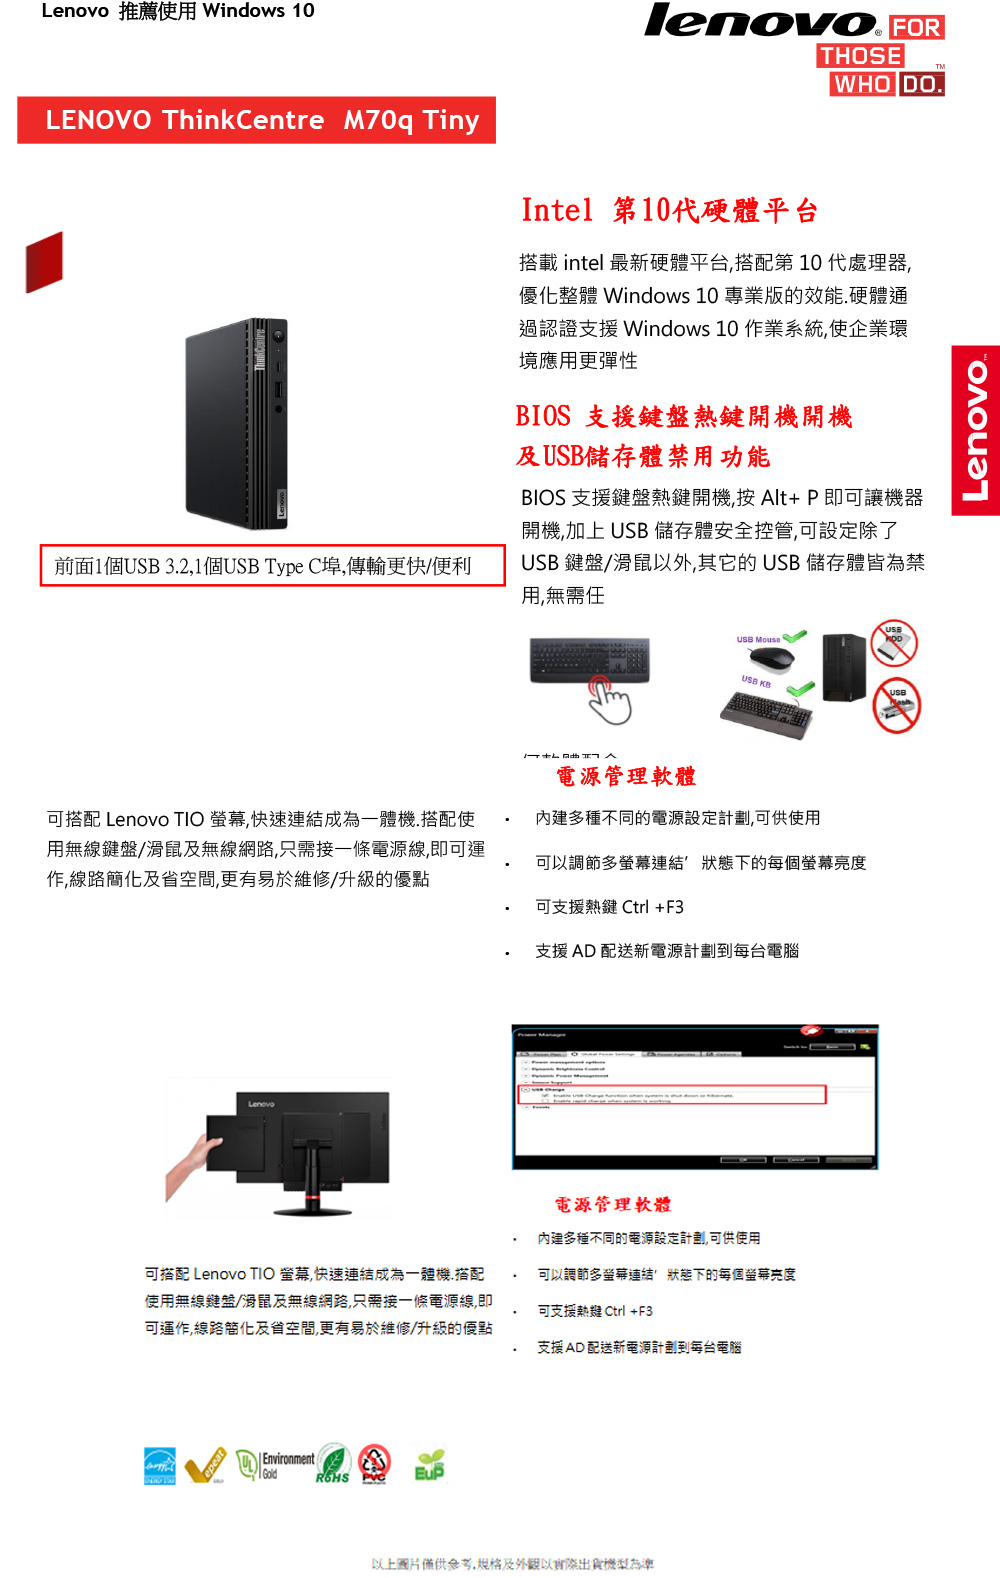 Bios 設定 Lenovo